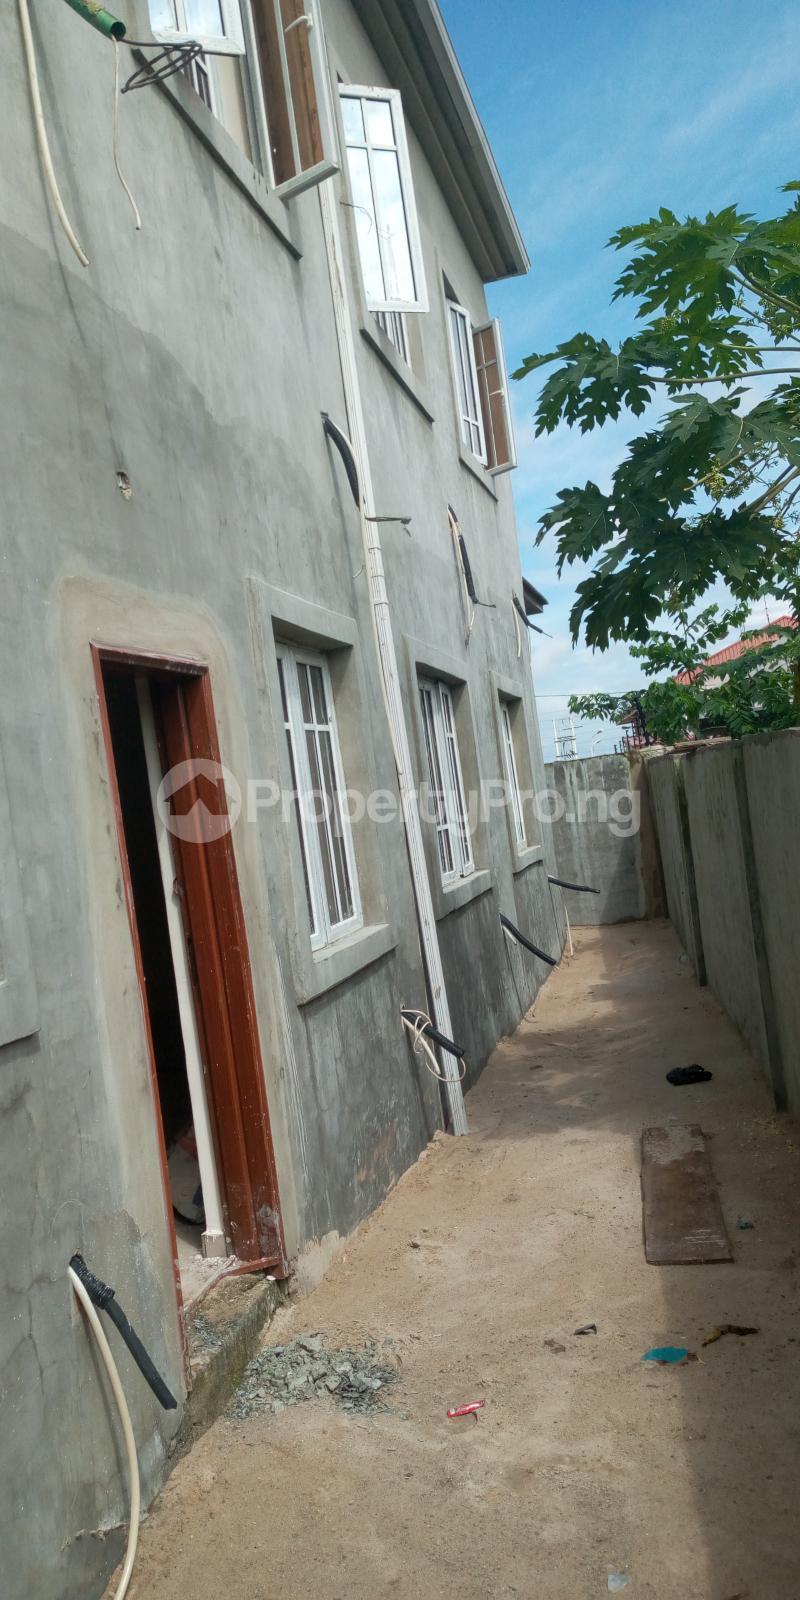 School Commercial Property for sale Eputu Ibeju-Lekki Lagos - 3